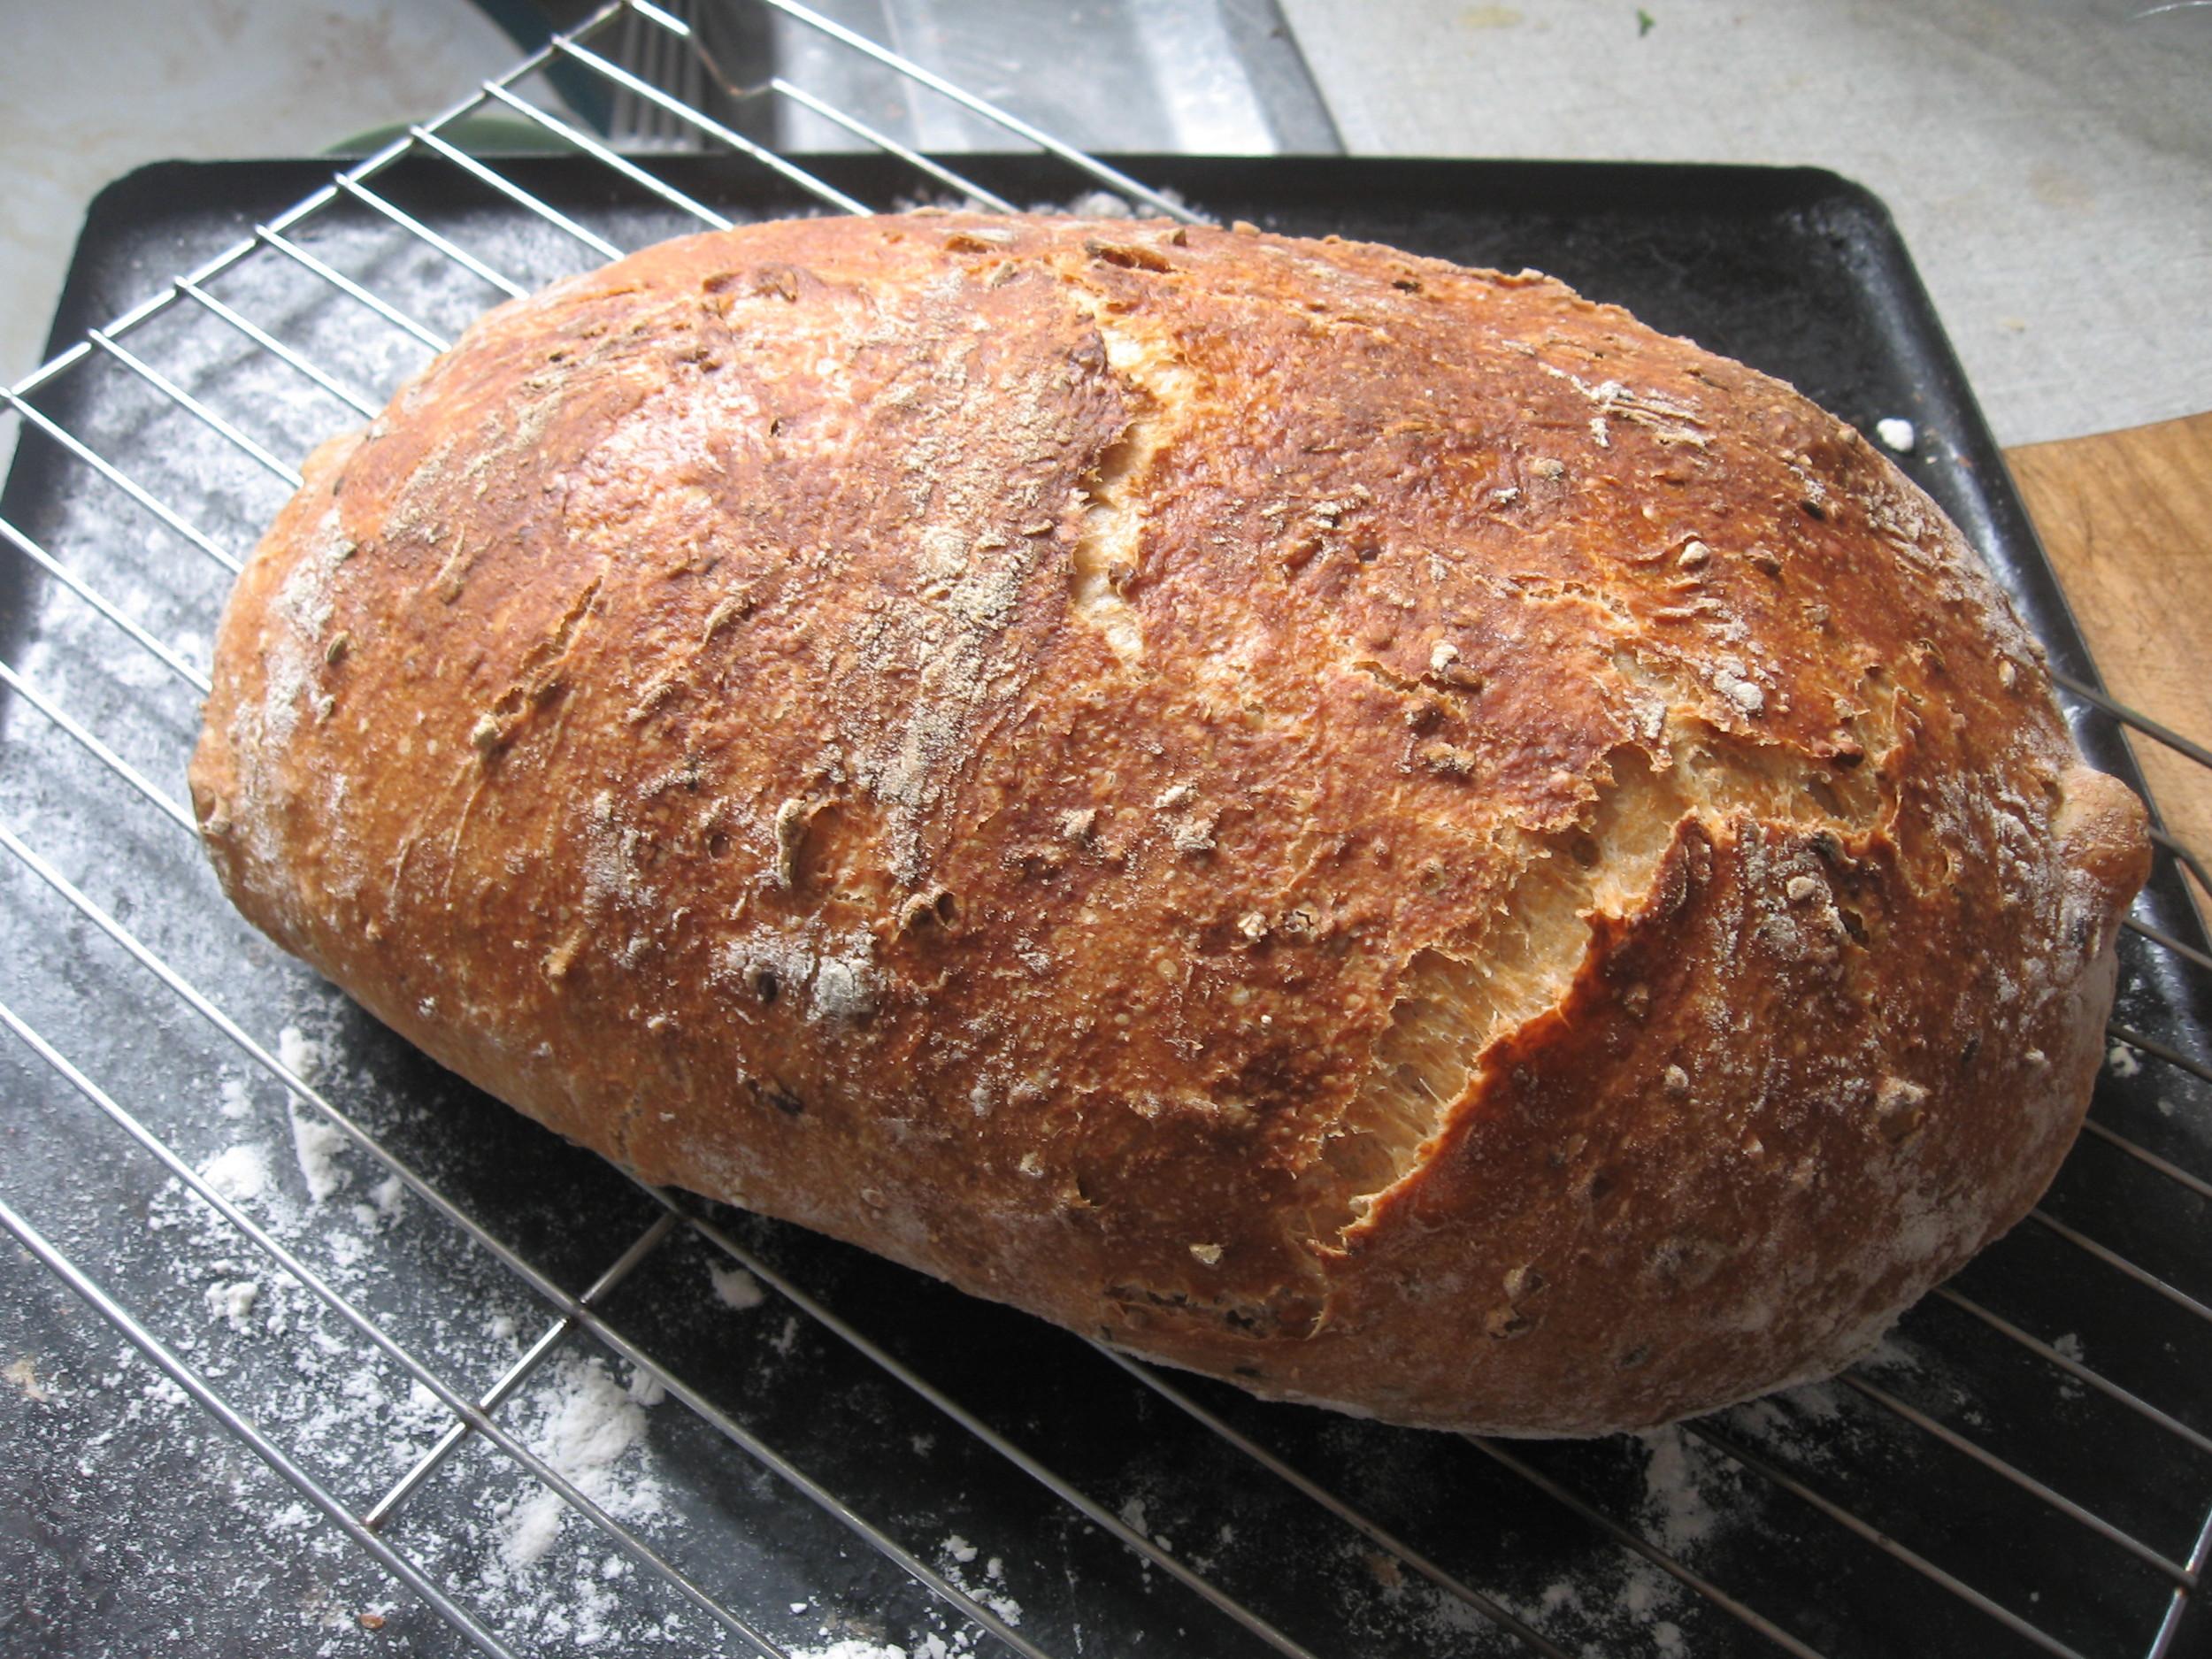 Home made no-knead bread